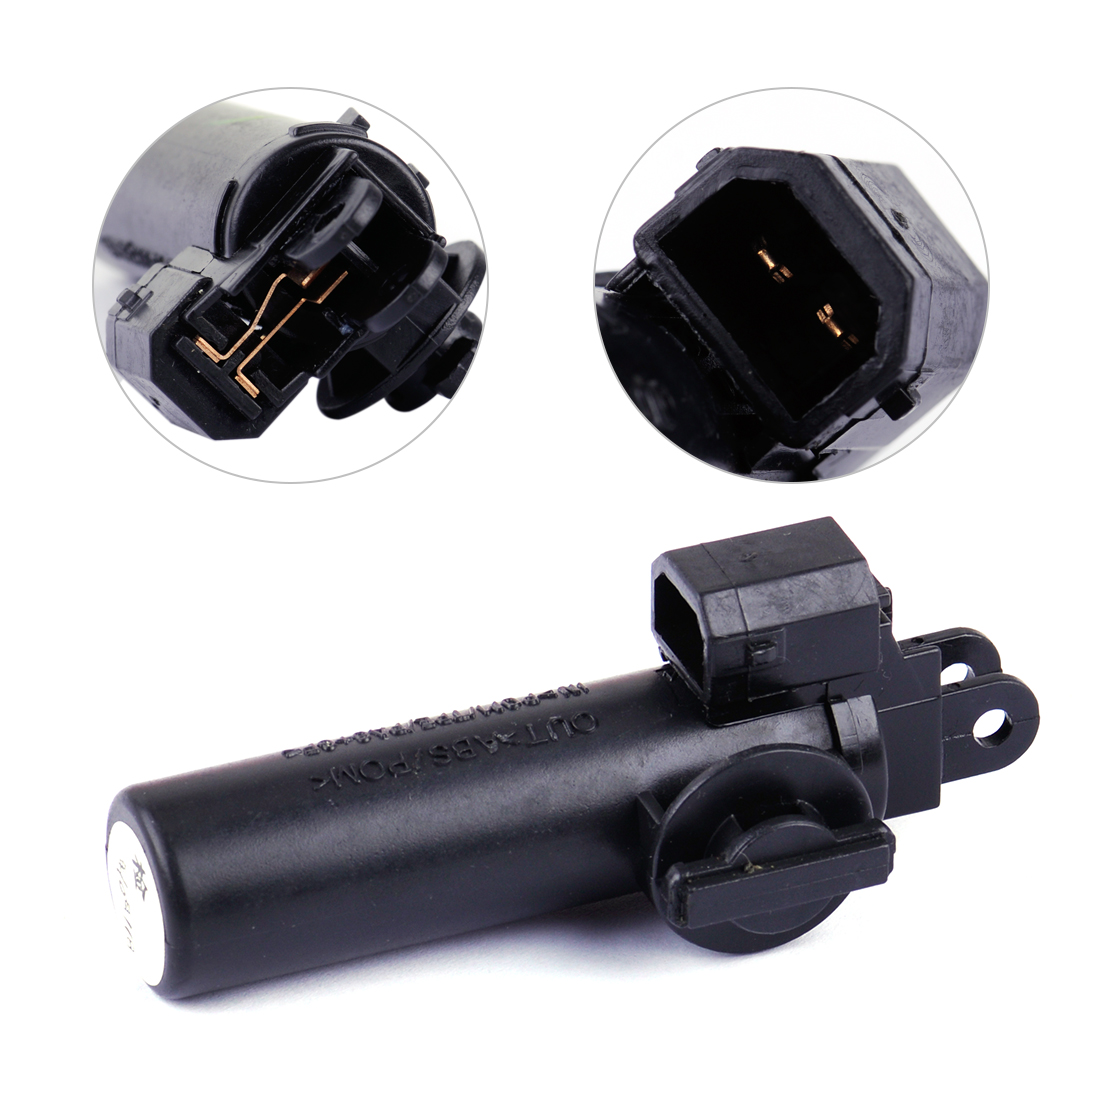 dwcx 2 pinos caixa de luva preta rolha amortecedor freio elemento interruptor 8k1880324 apto para audi